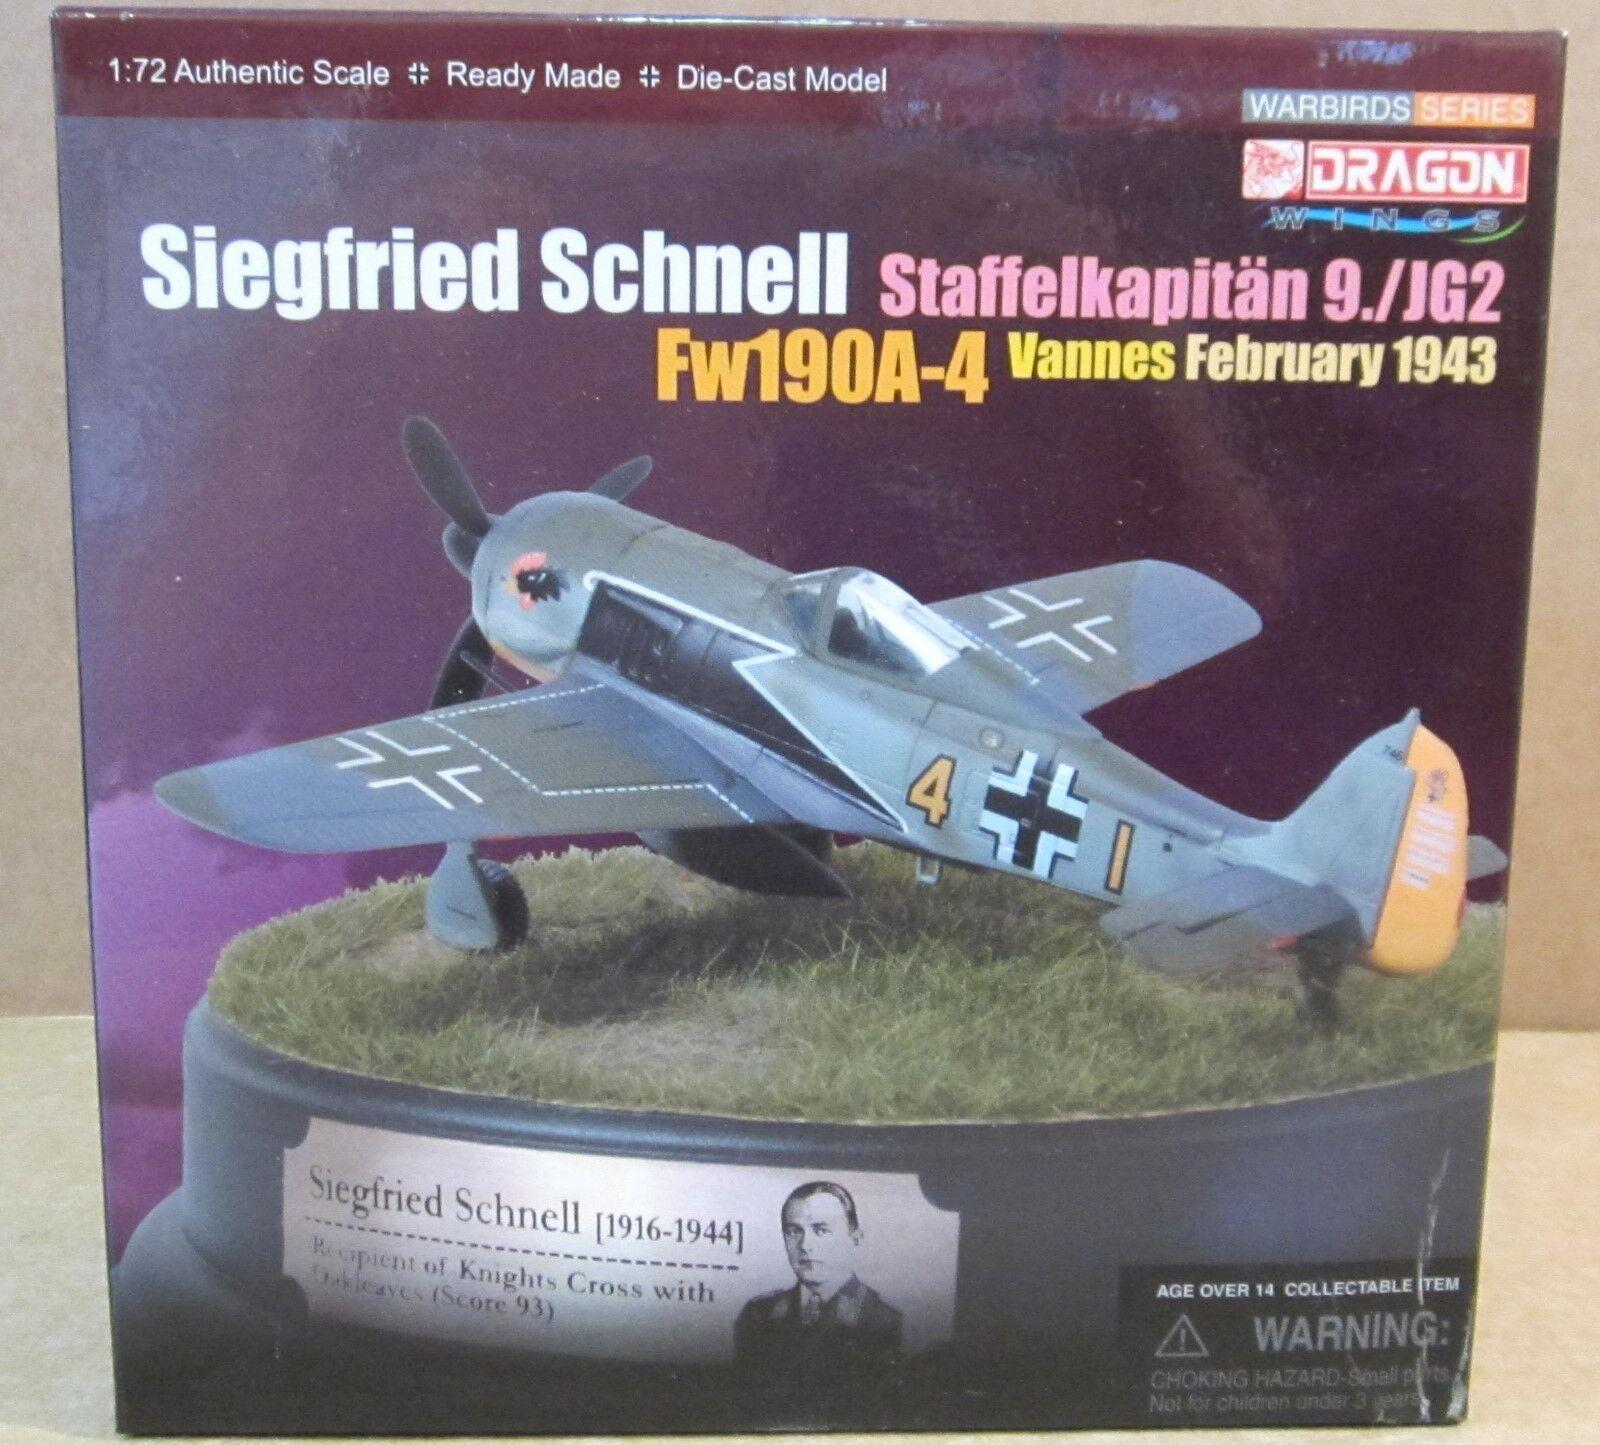 Fw109a-4 9   jg2 staffelkapitan siegfried schnell vannes flugzeug   bombenleger + basis 1 72